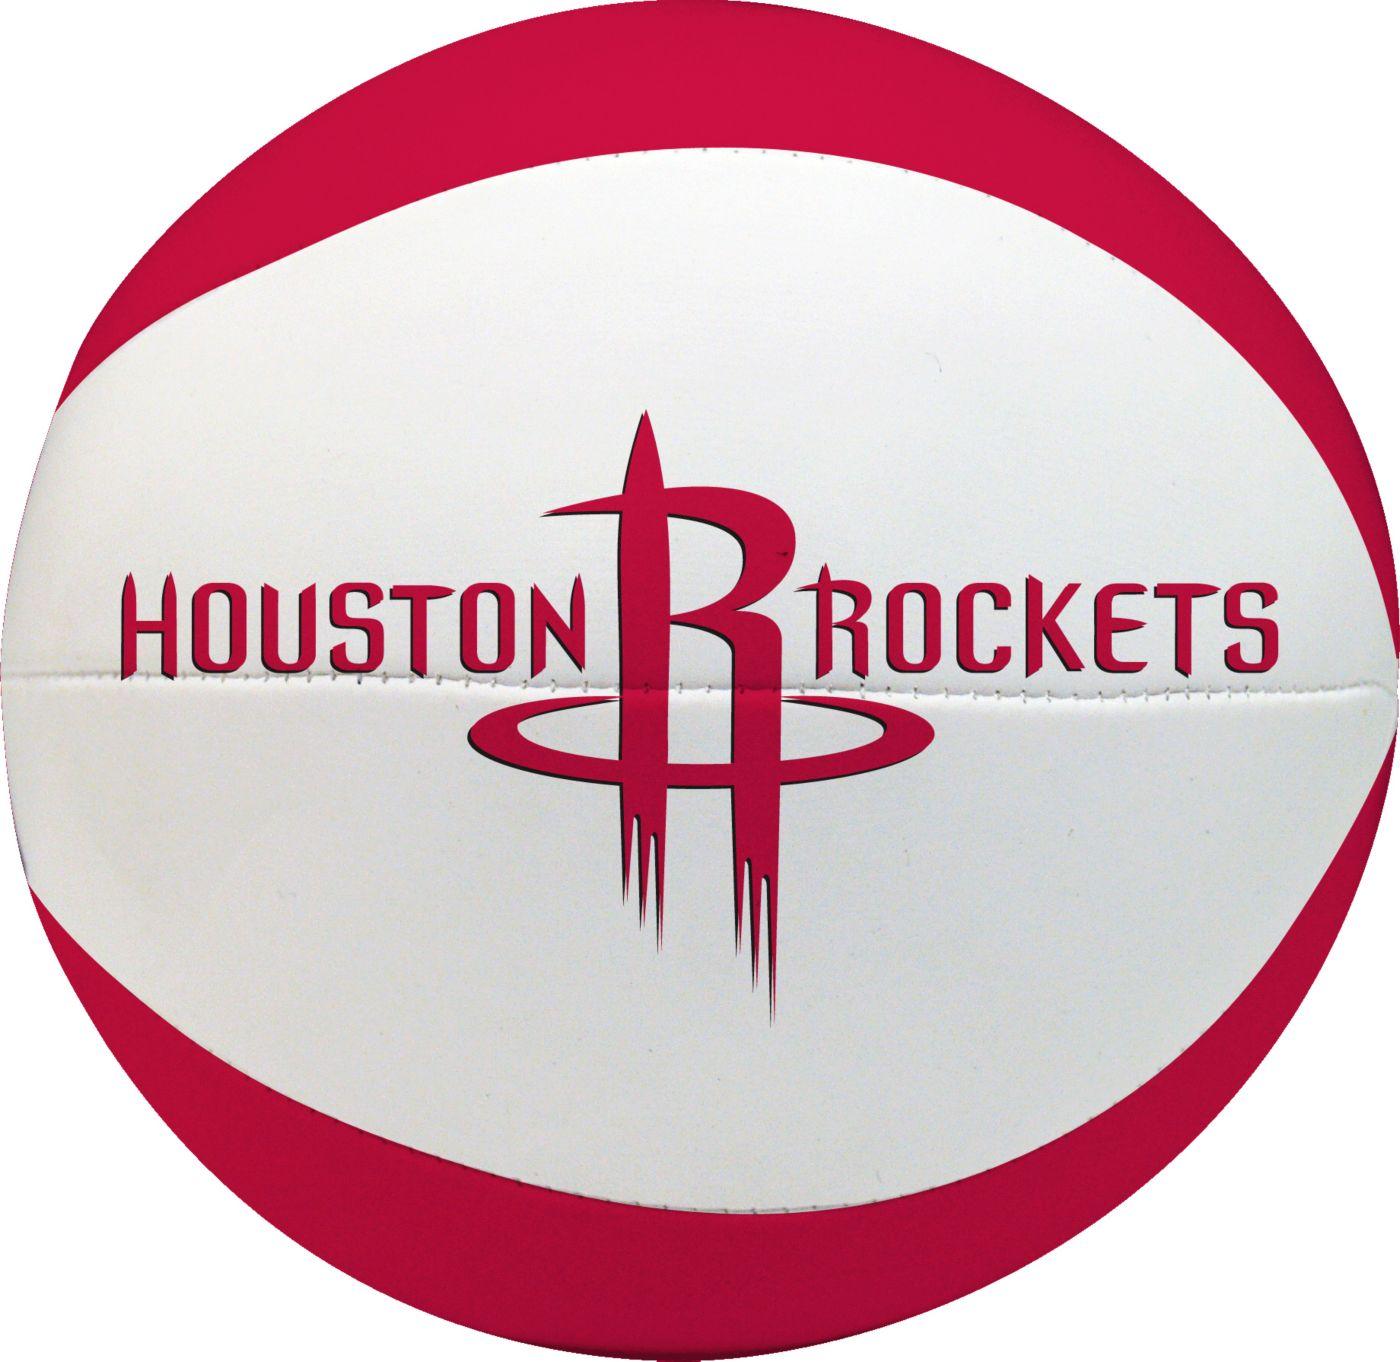 "Rawlings Houston Rockets 4"" Softee Basketball"